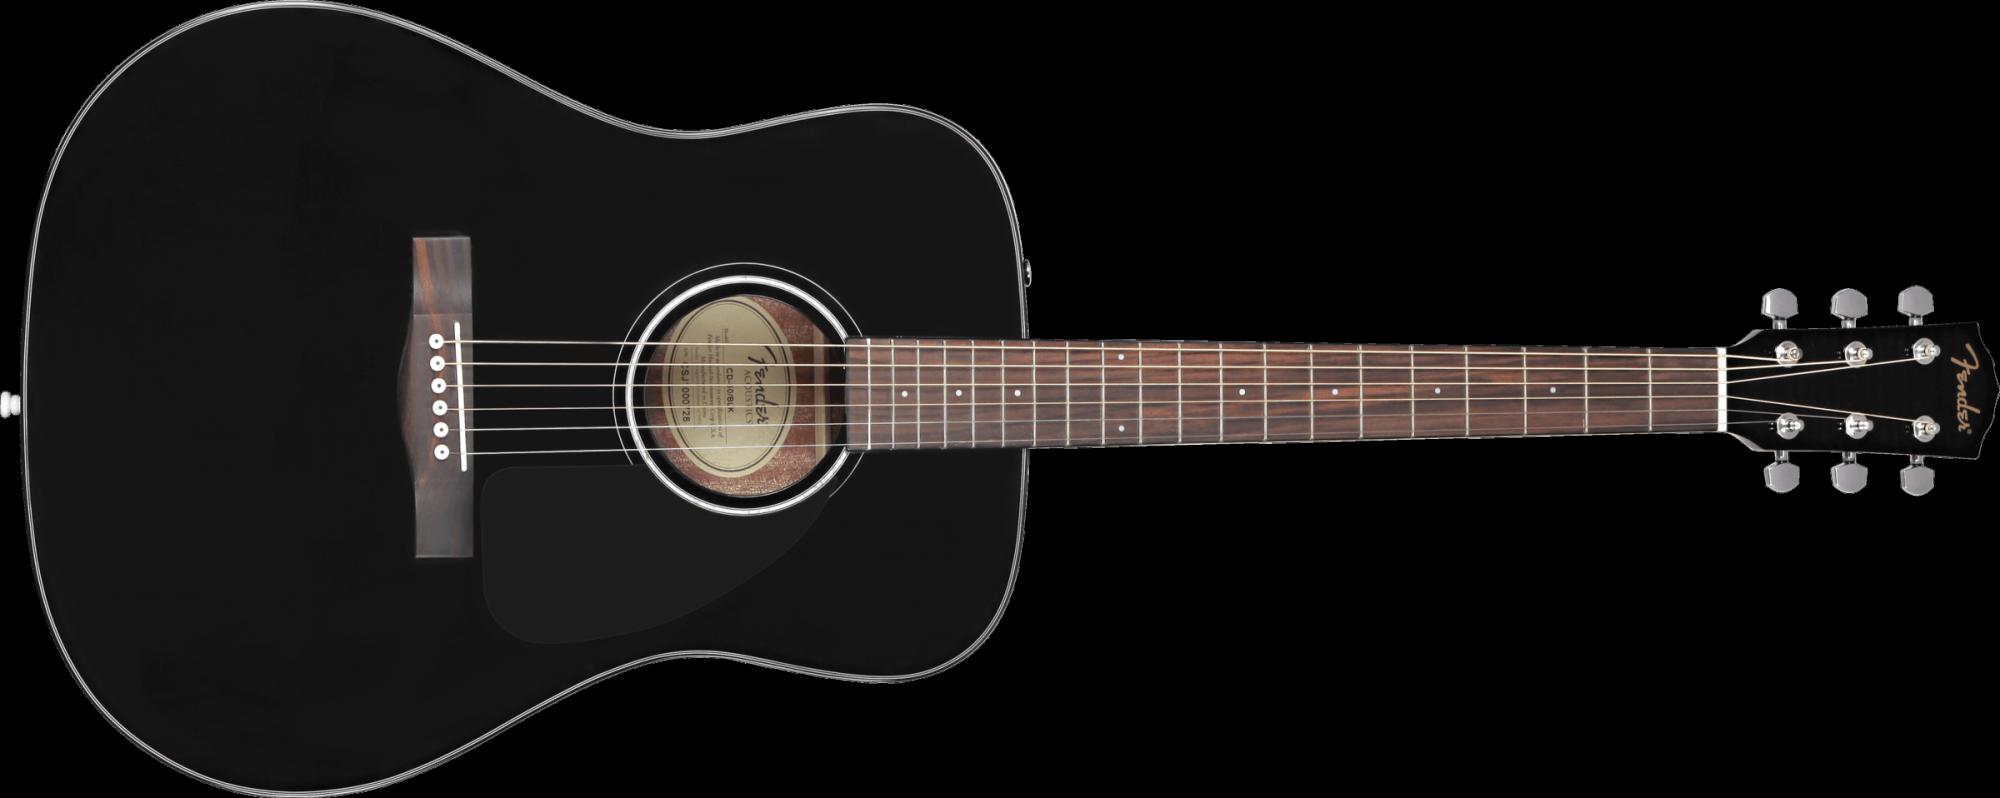 Fender CD-60 Classic Design Acoustic Guitar Black